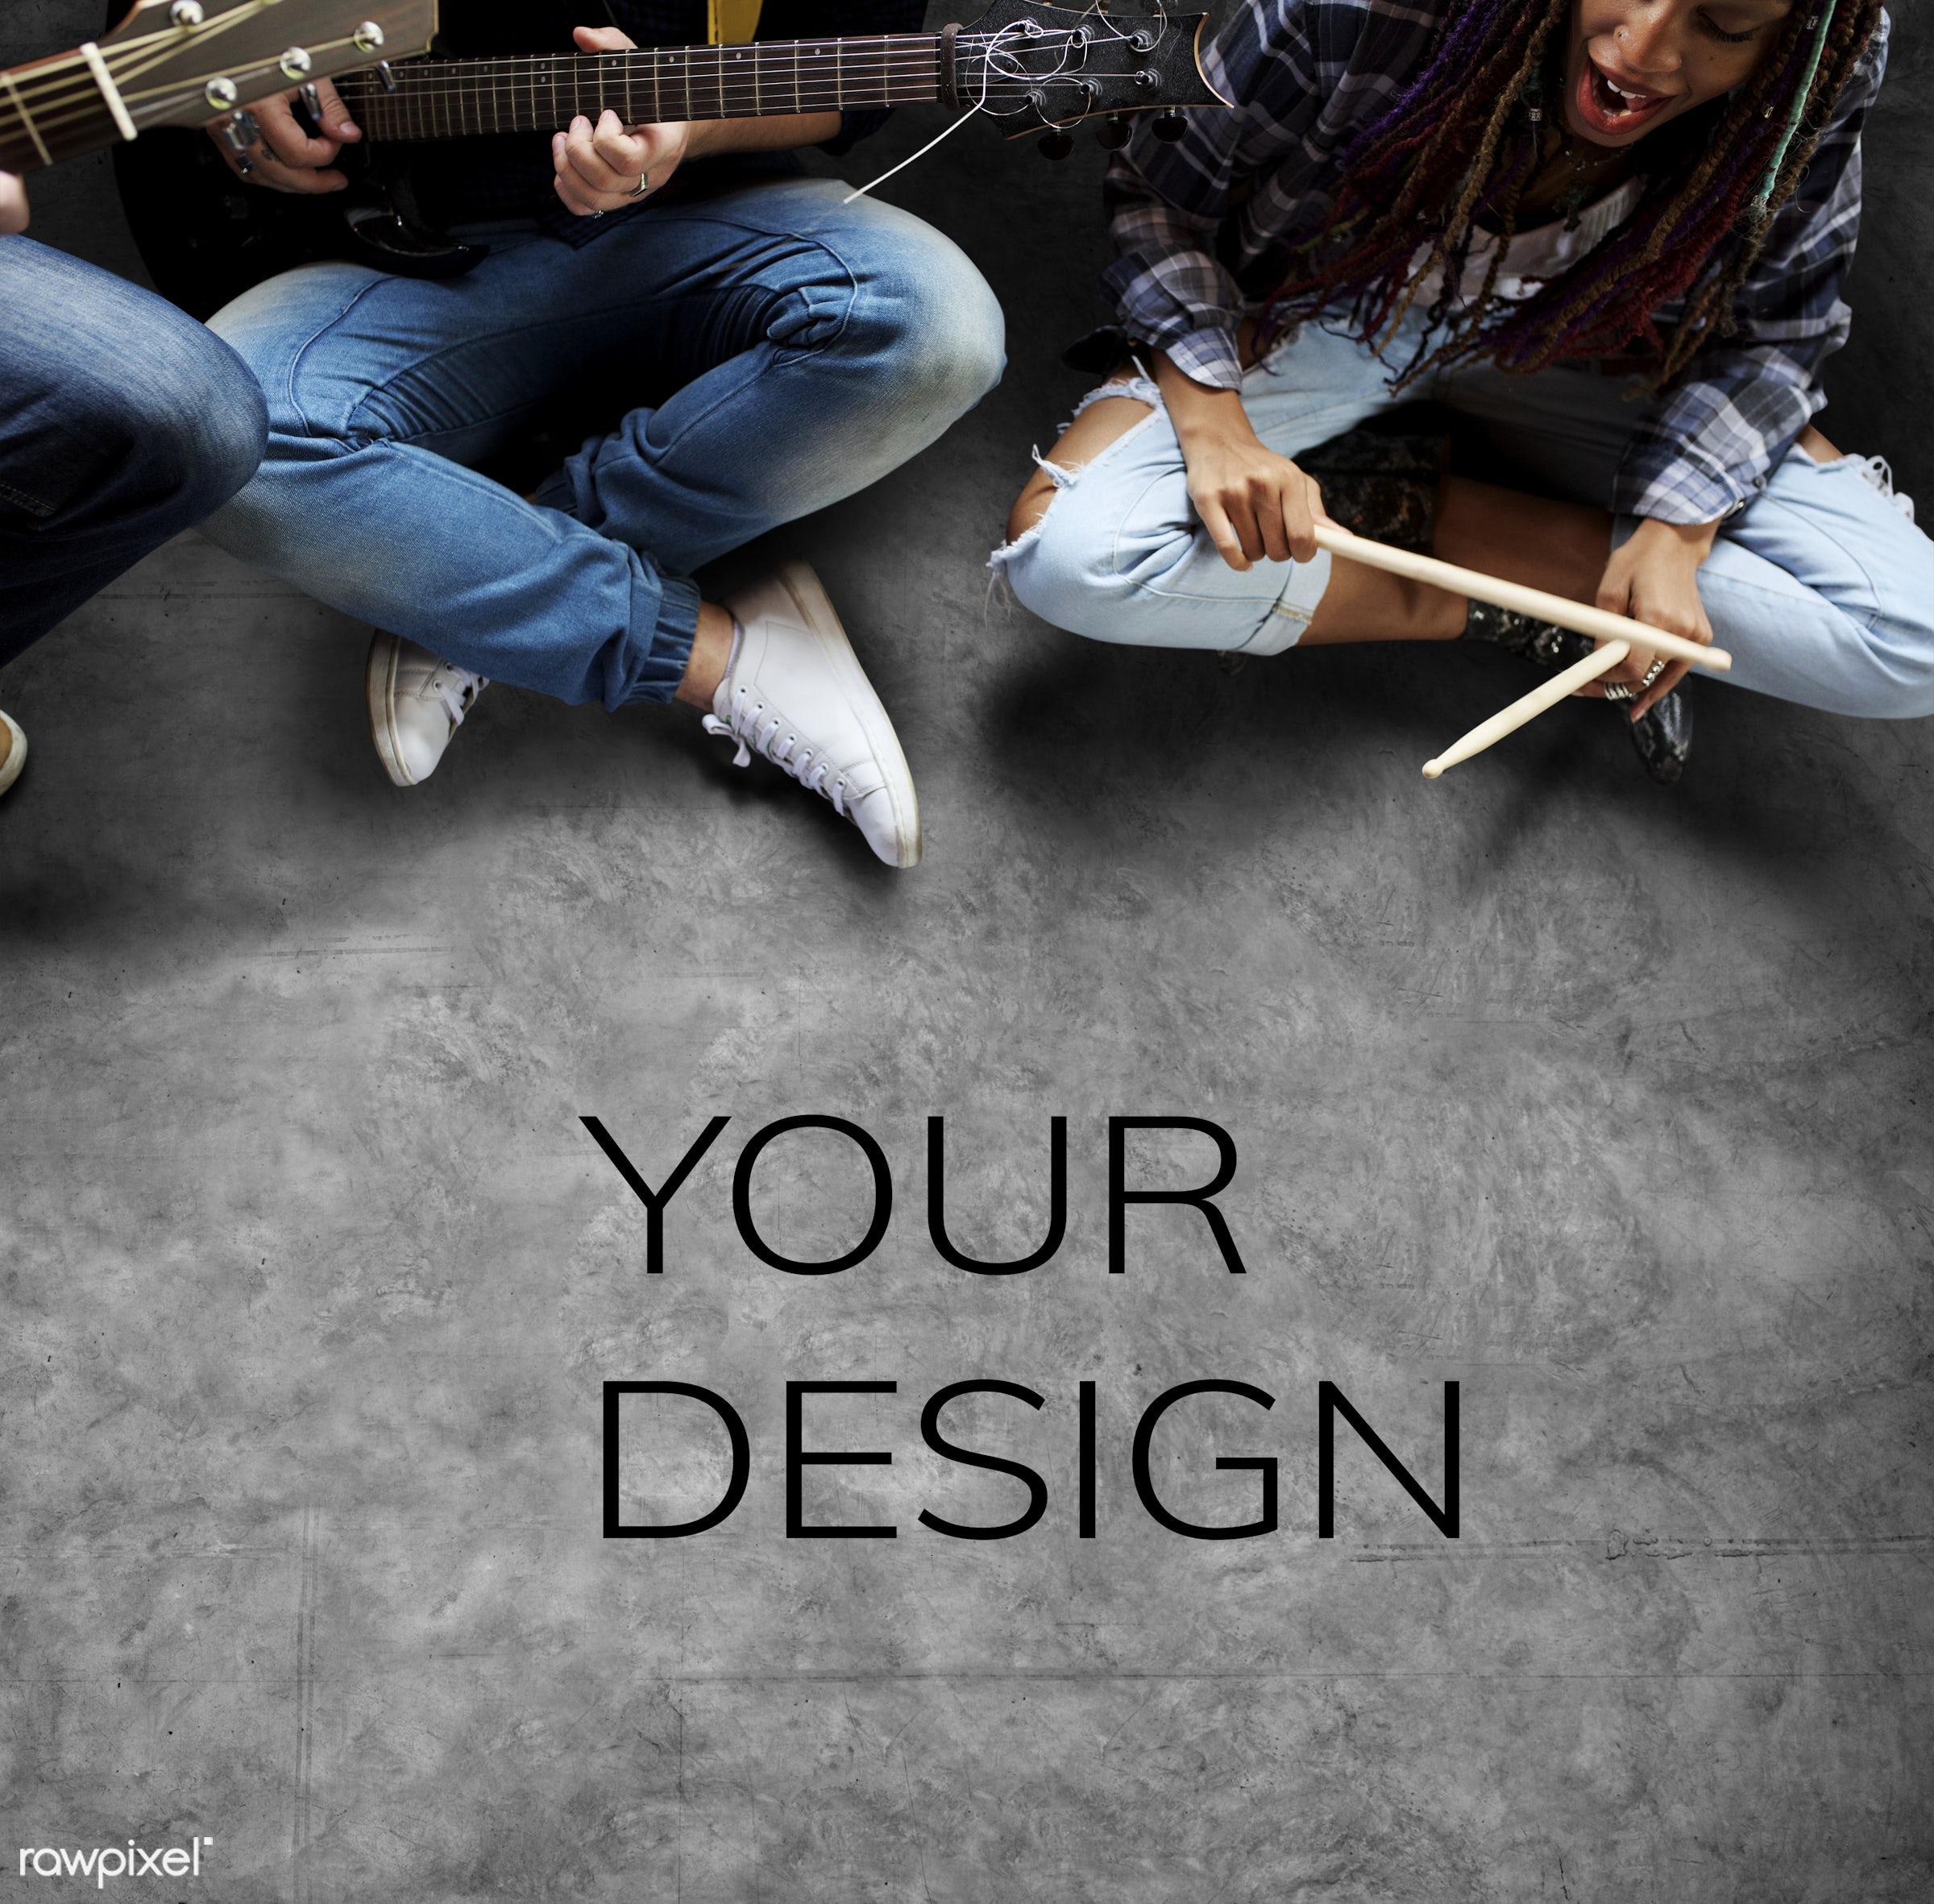 music, guitarist, adult, band, career, cheerful, copy space, diversity, drum sticks, drummer, enjoyment, floor, friends,...